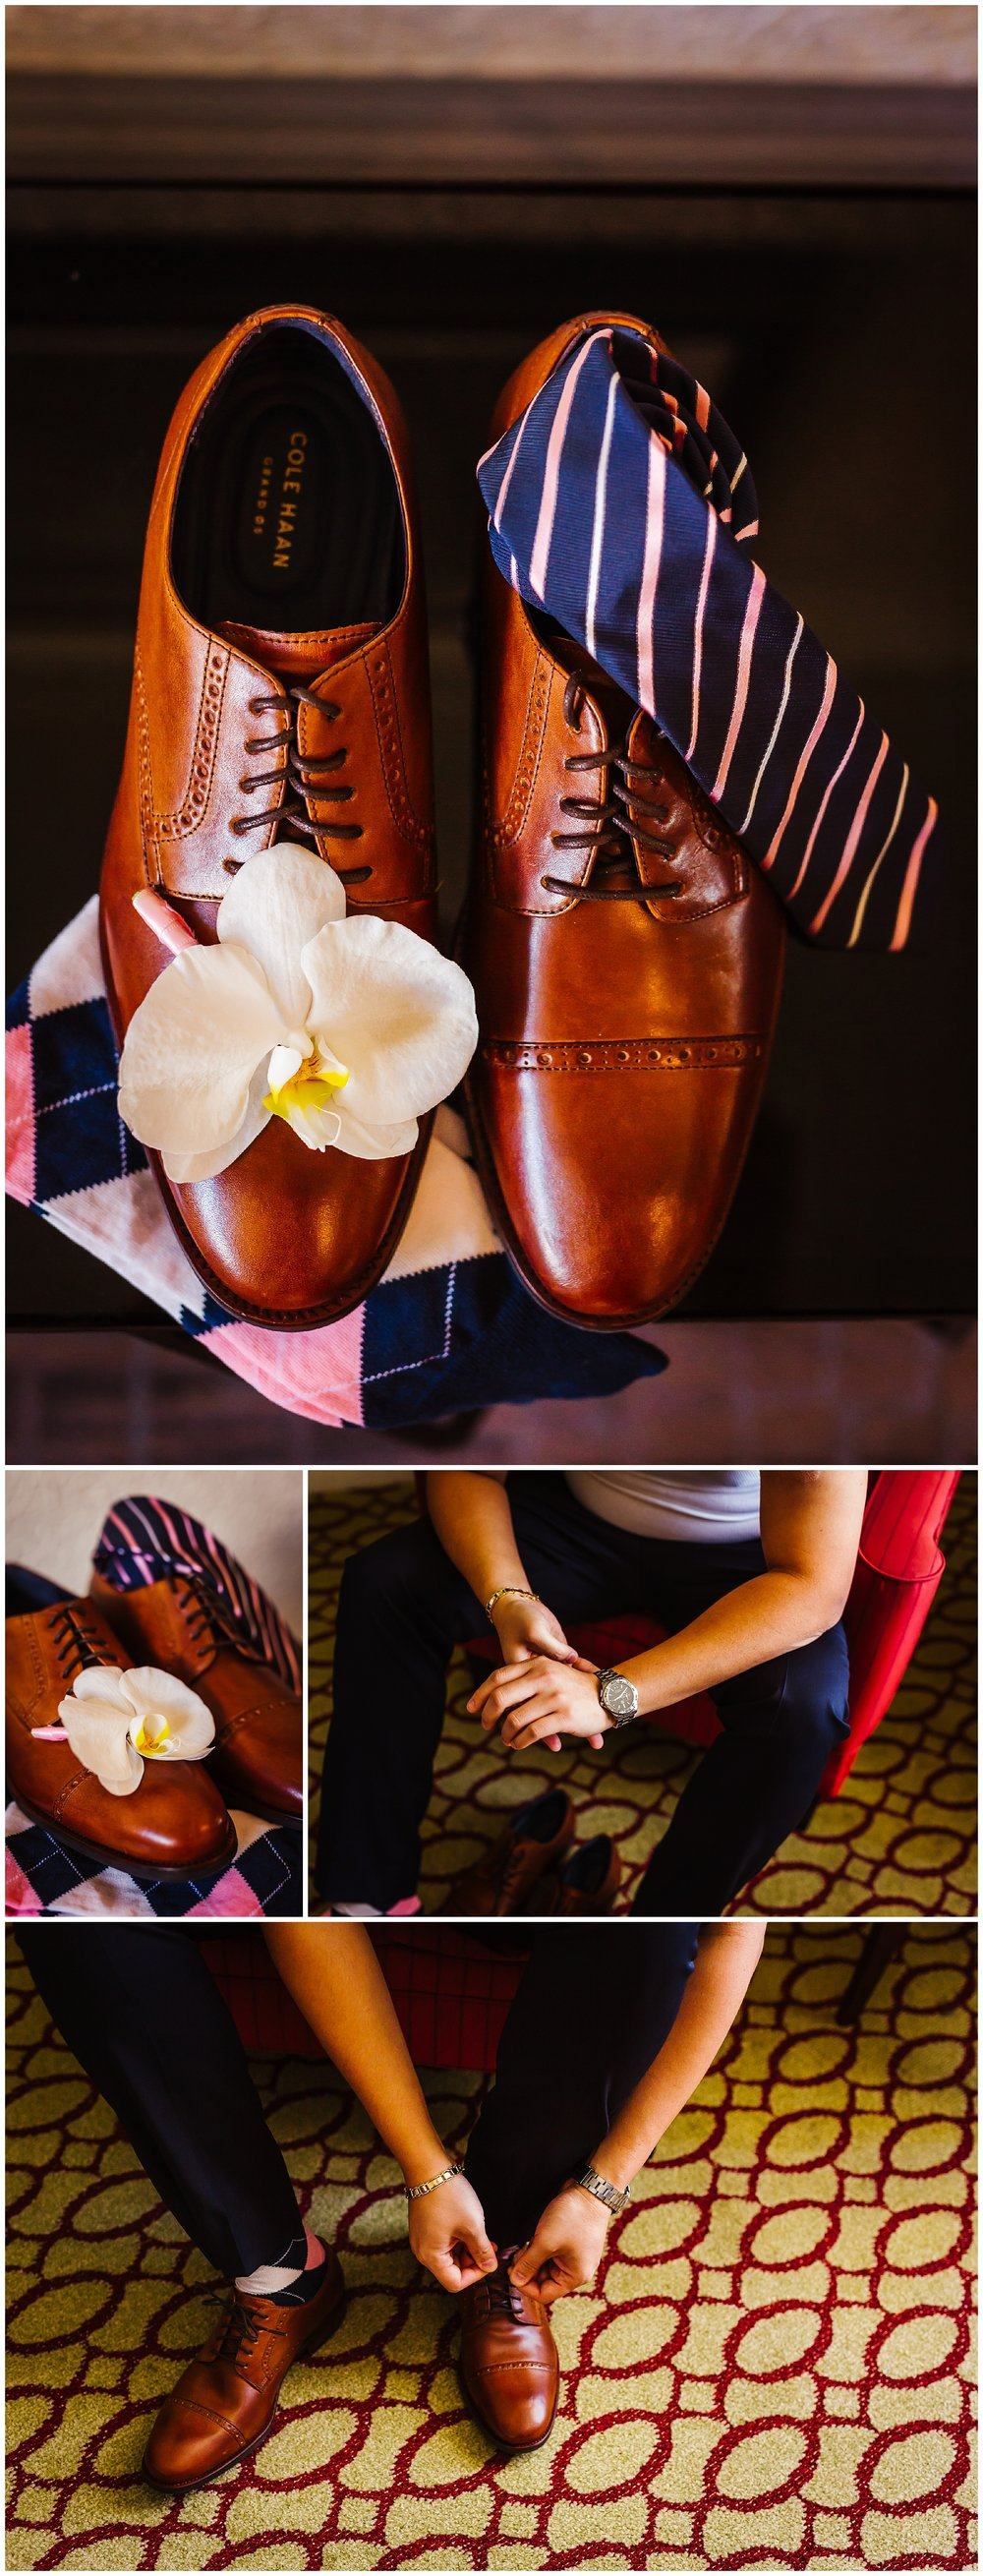 vinoy-sunset-ballroom-rainy-day-wedding-photography-orchids-trinidad-flawless-fetes-ashlee-hamon_0098.jpg